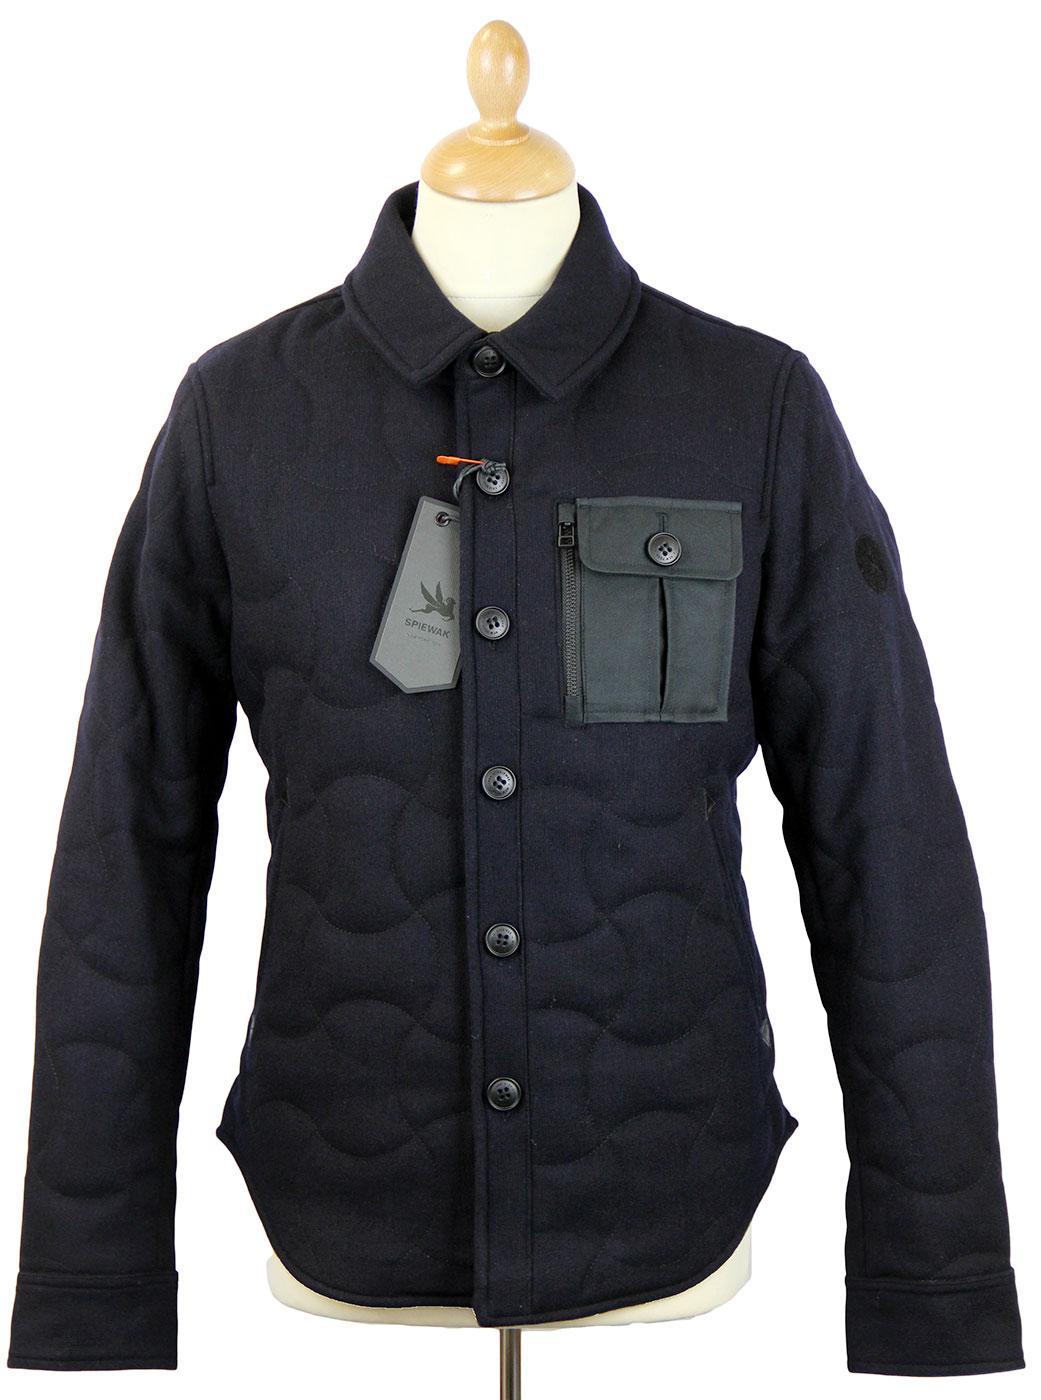 SPIEWAK Quilted CPO Retro Mod Melton Short Jacket